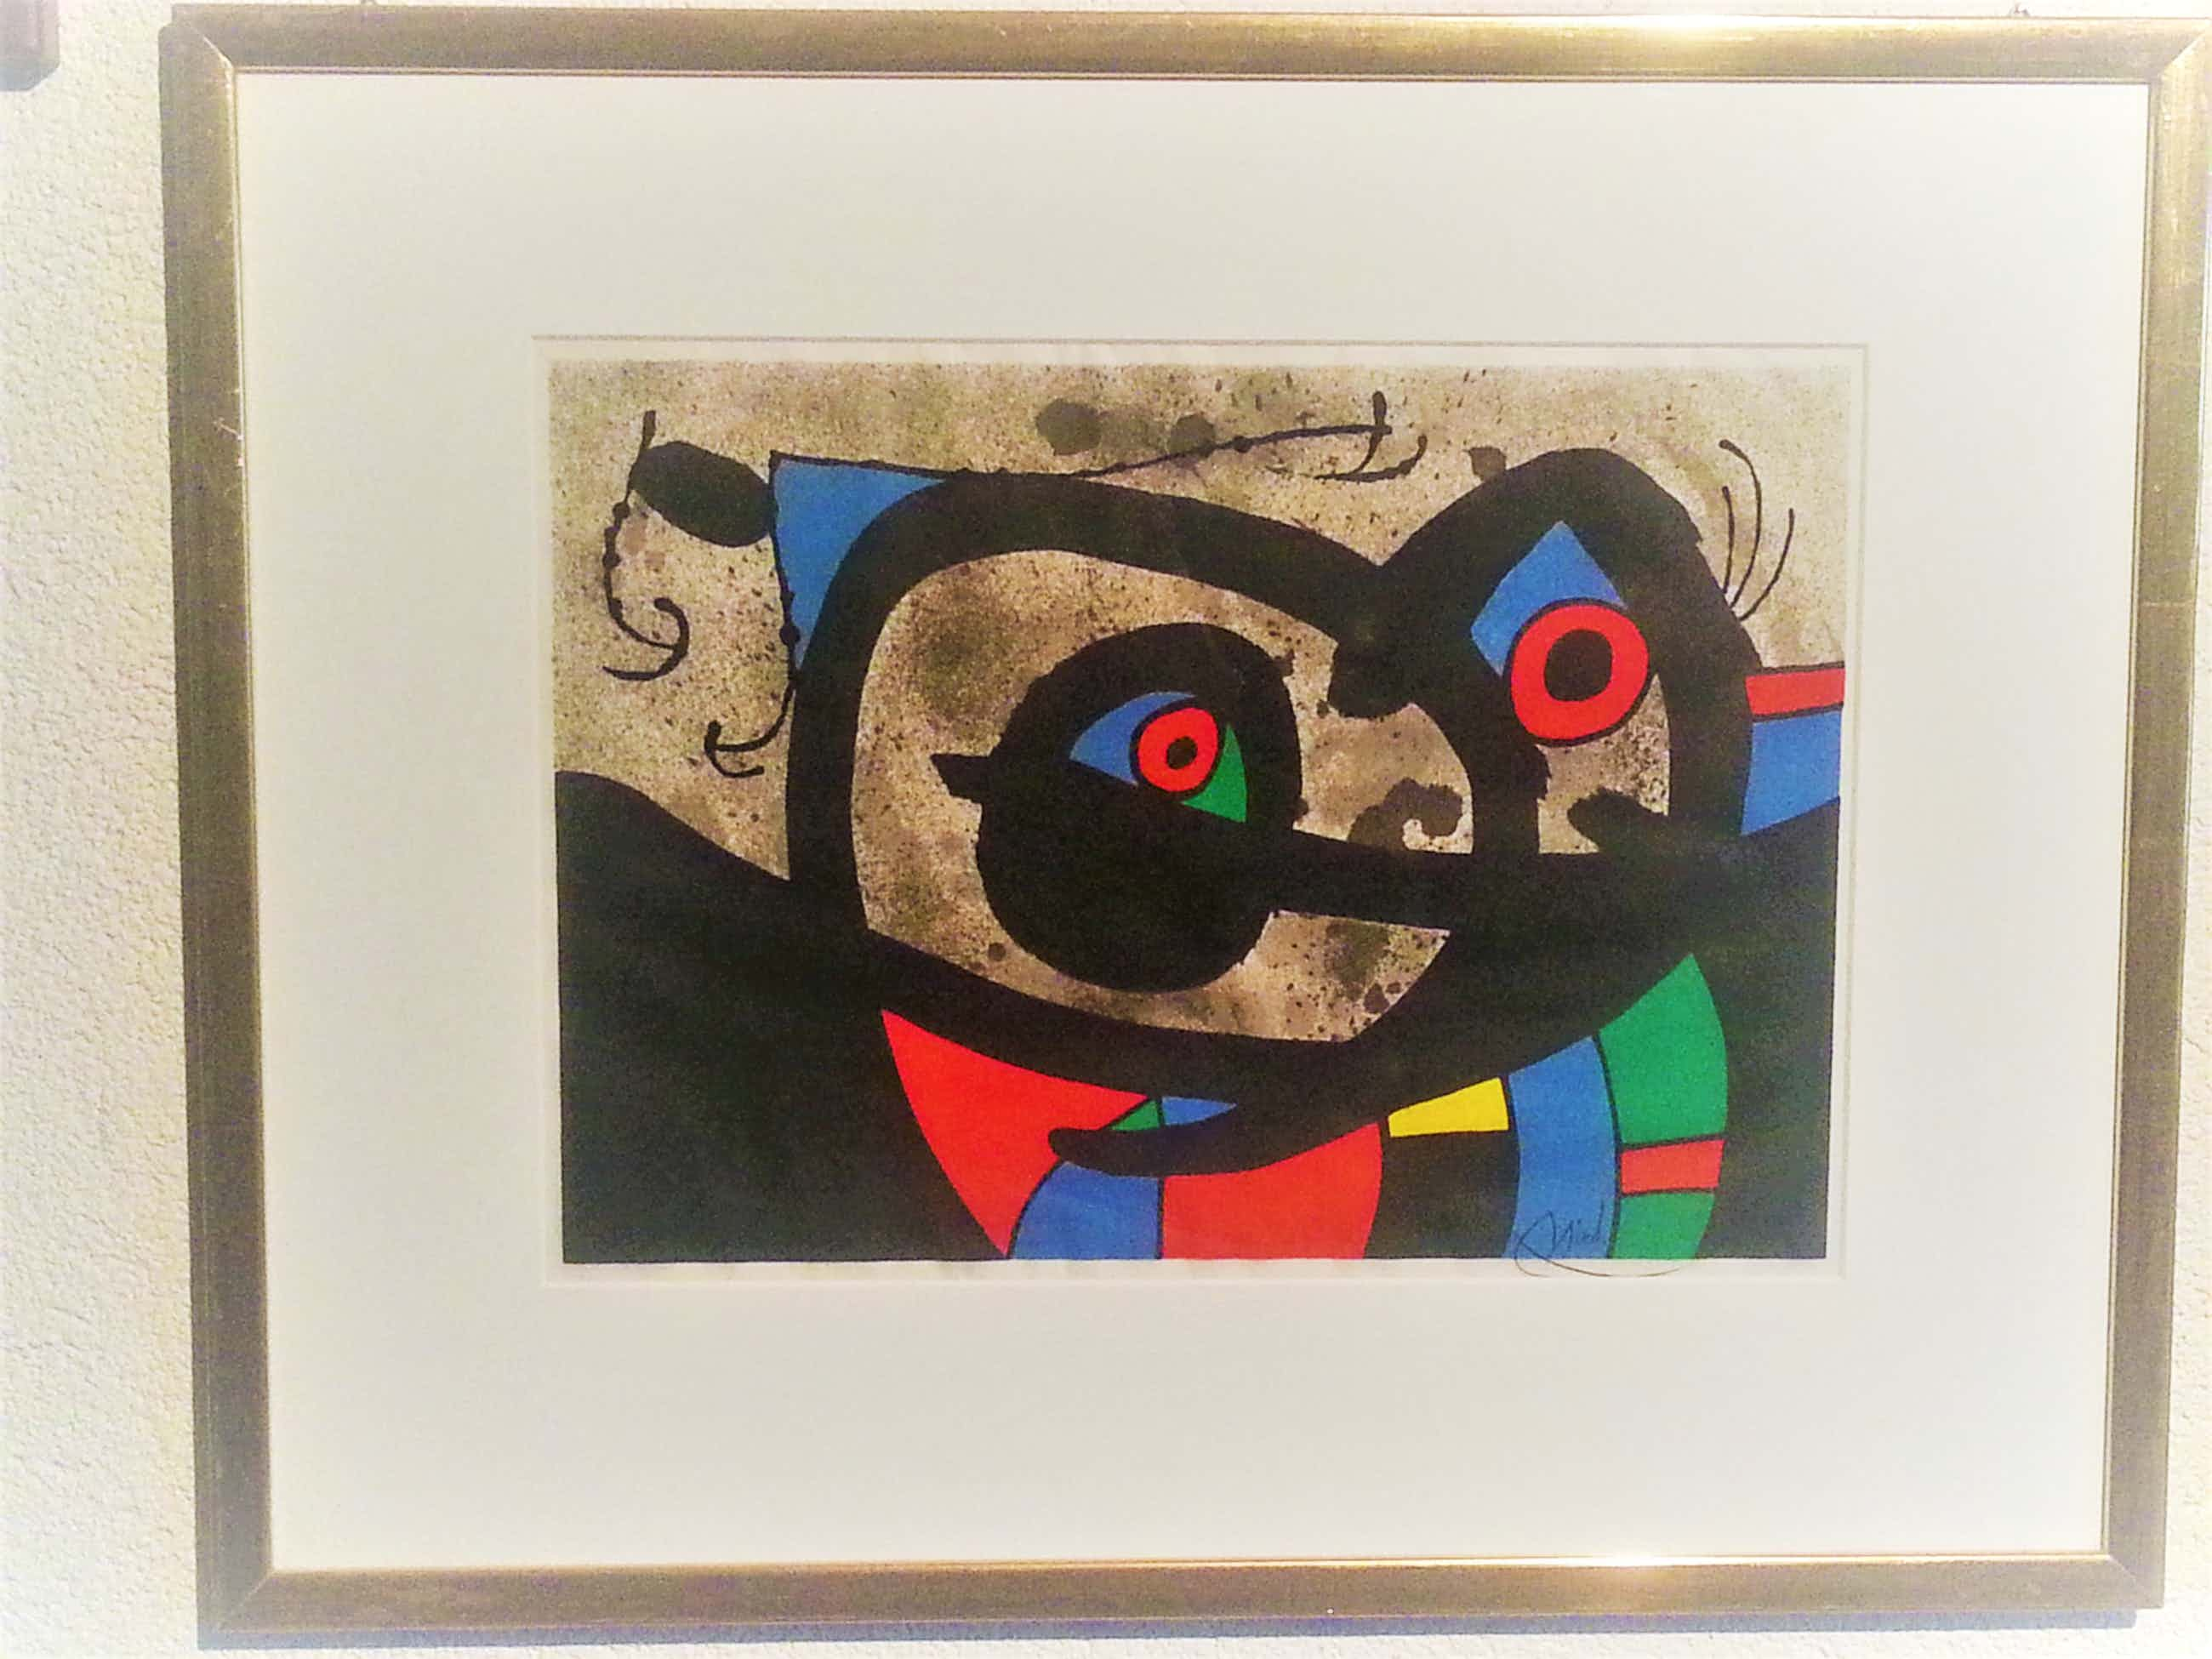 Joan Miro - Die Eidechse mit den Goldfedern kopen? Bied vanaf 11380!